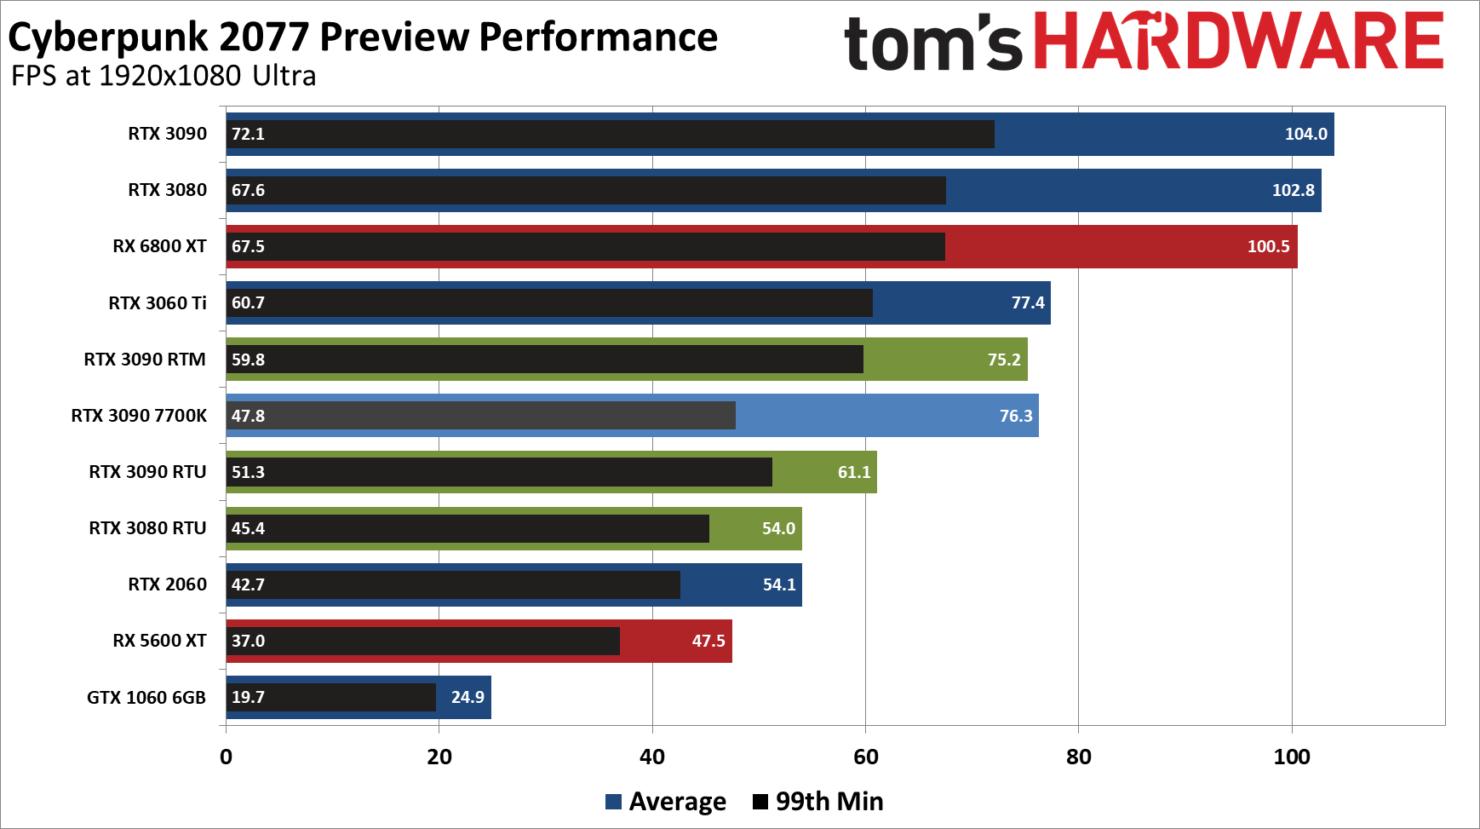 cyberpunk-2077-pc-performance-benchmarks_-amd-nvidia-gpus-_-1080p-ultra